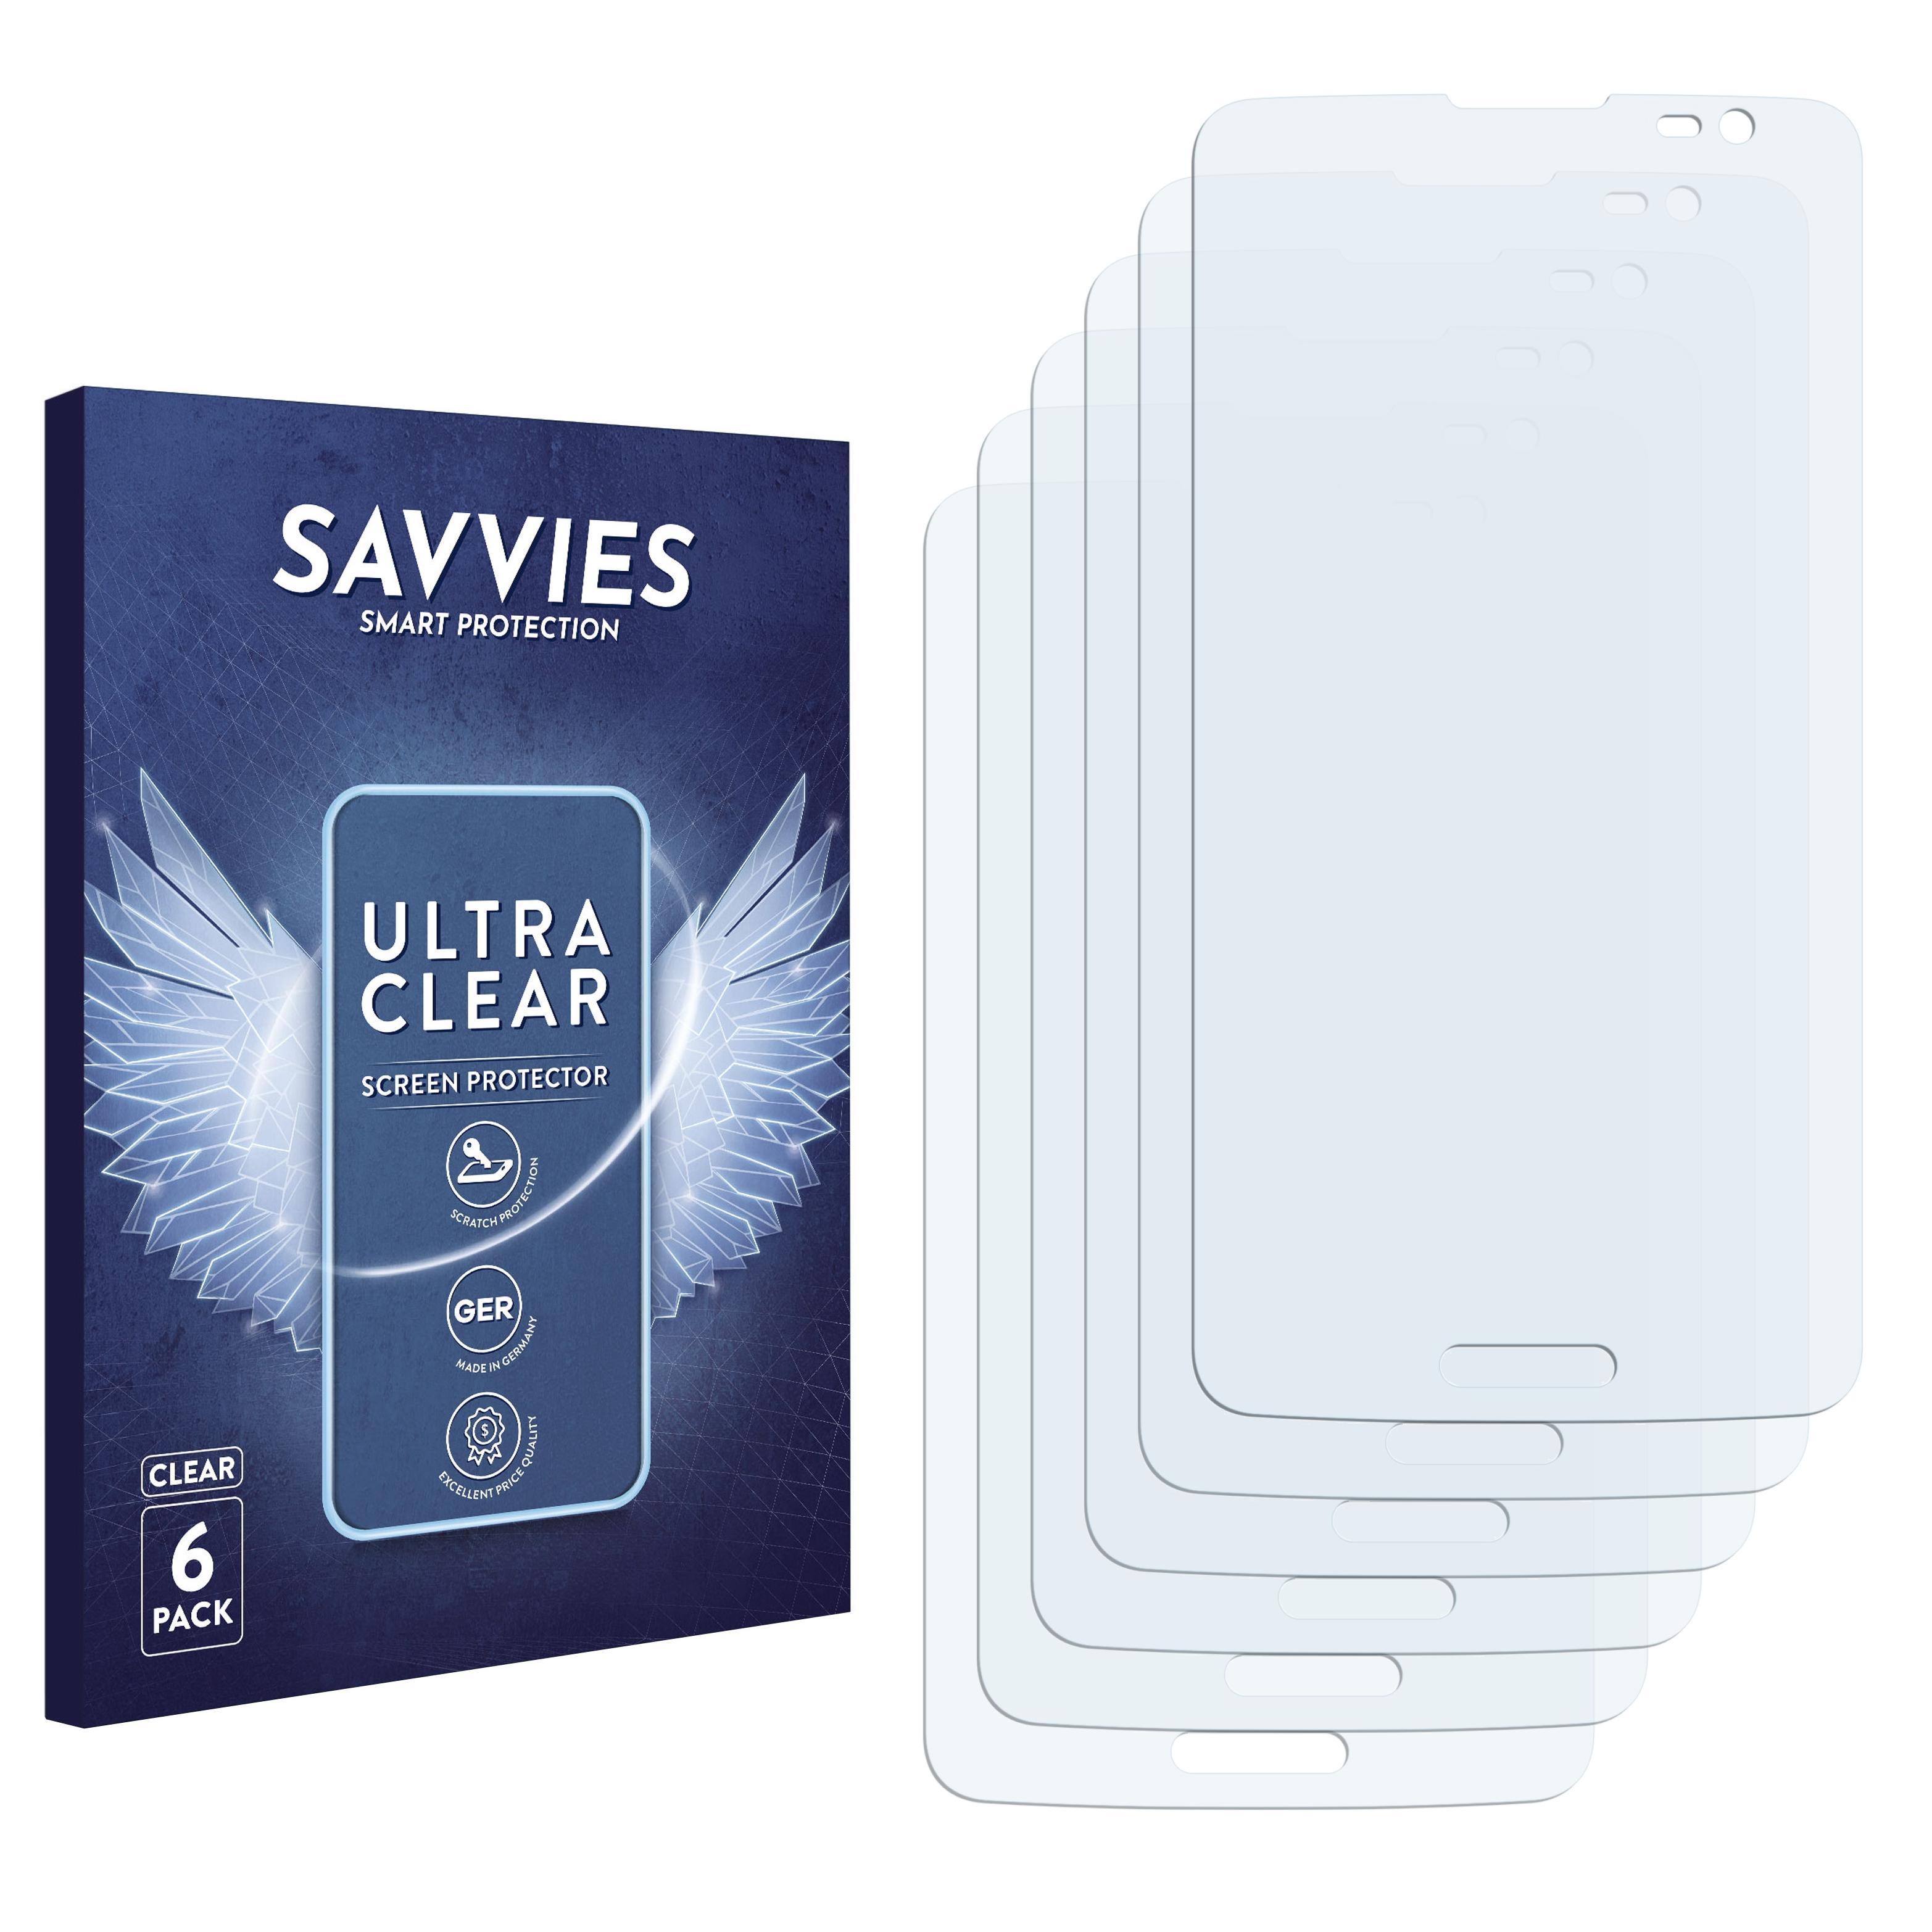 Ochranná fólie Savvies na LG G Pro Lite D684, 6ks